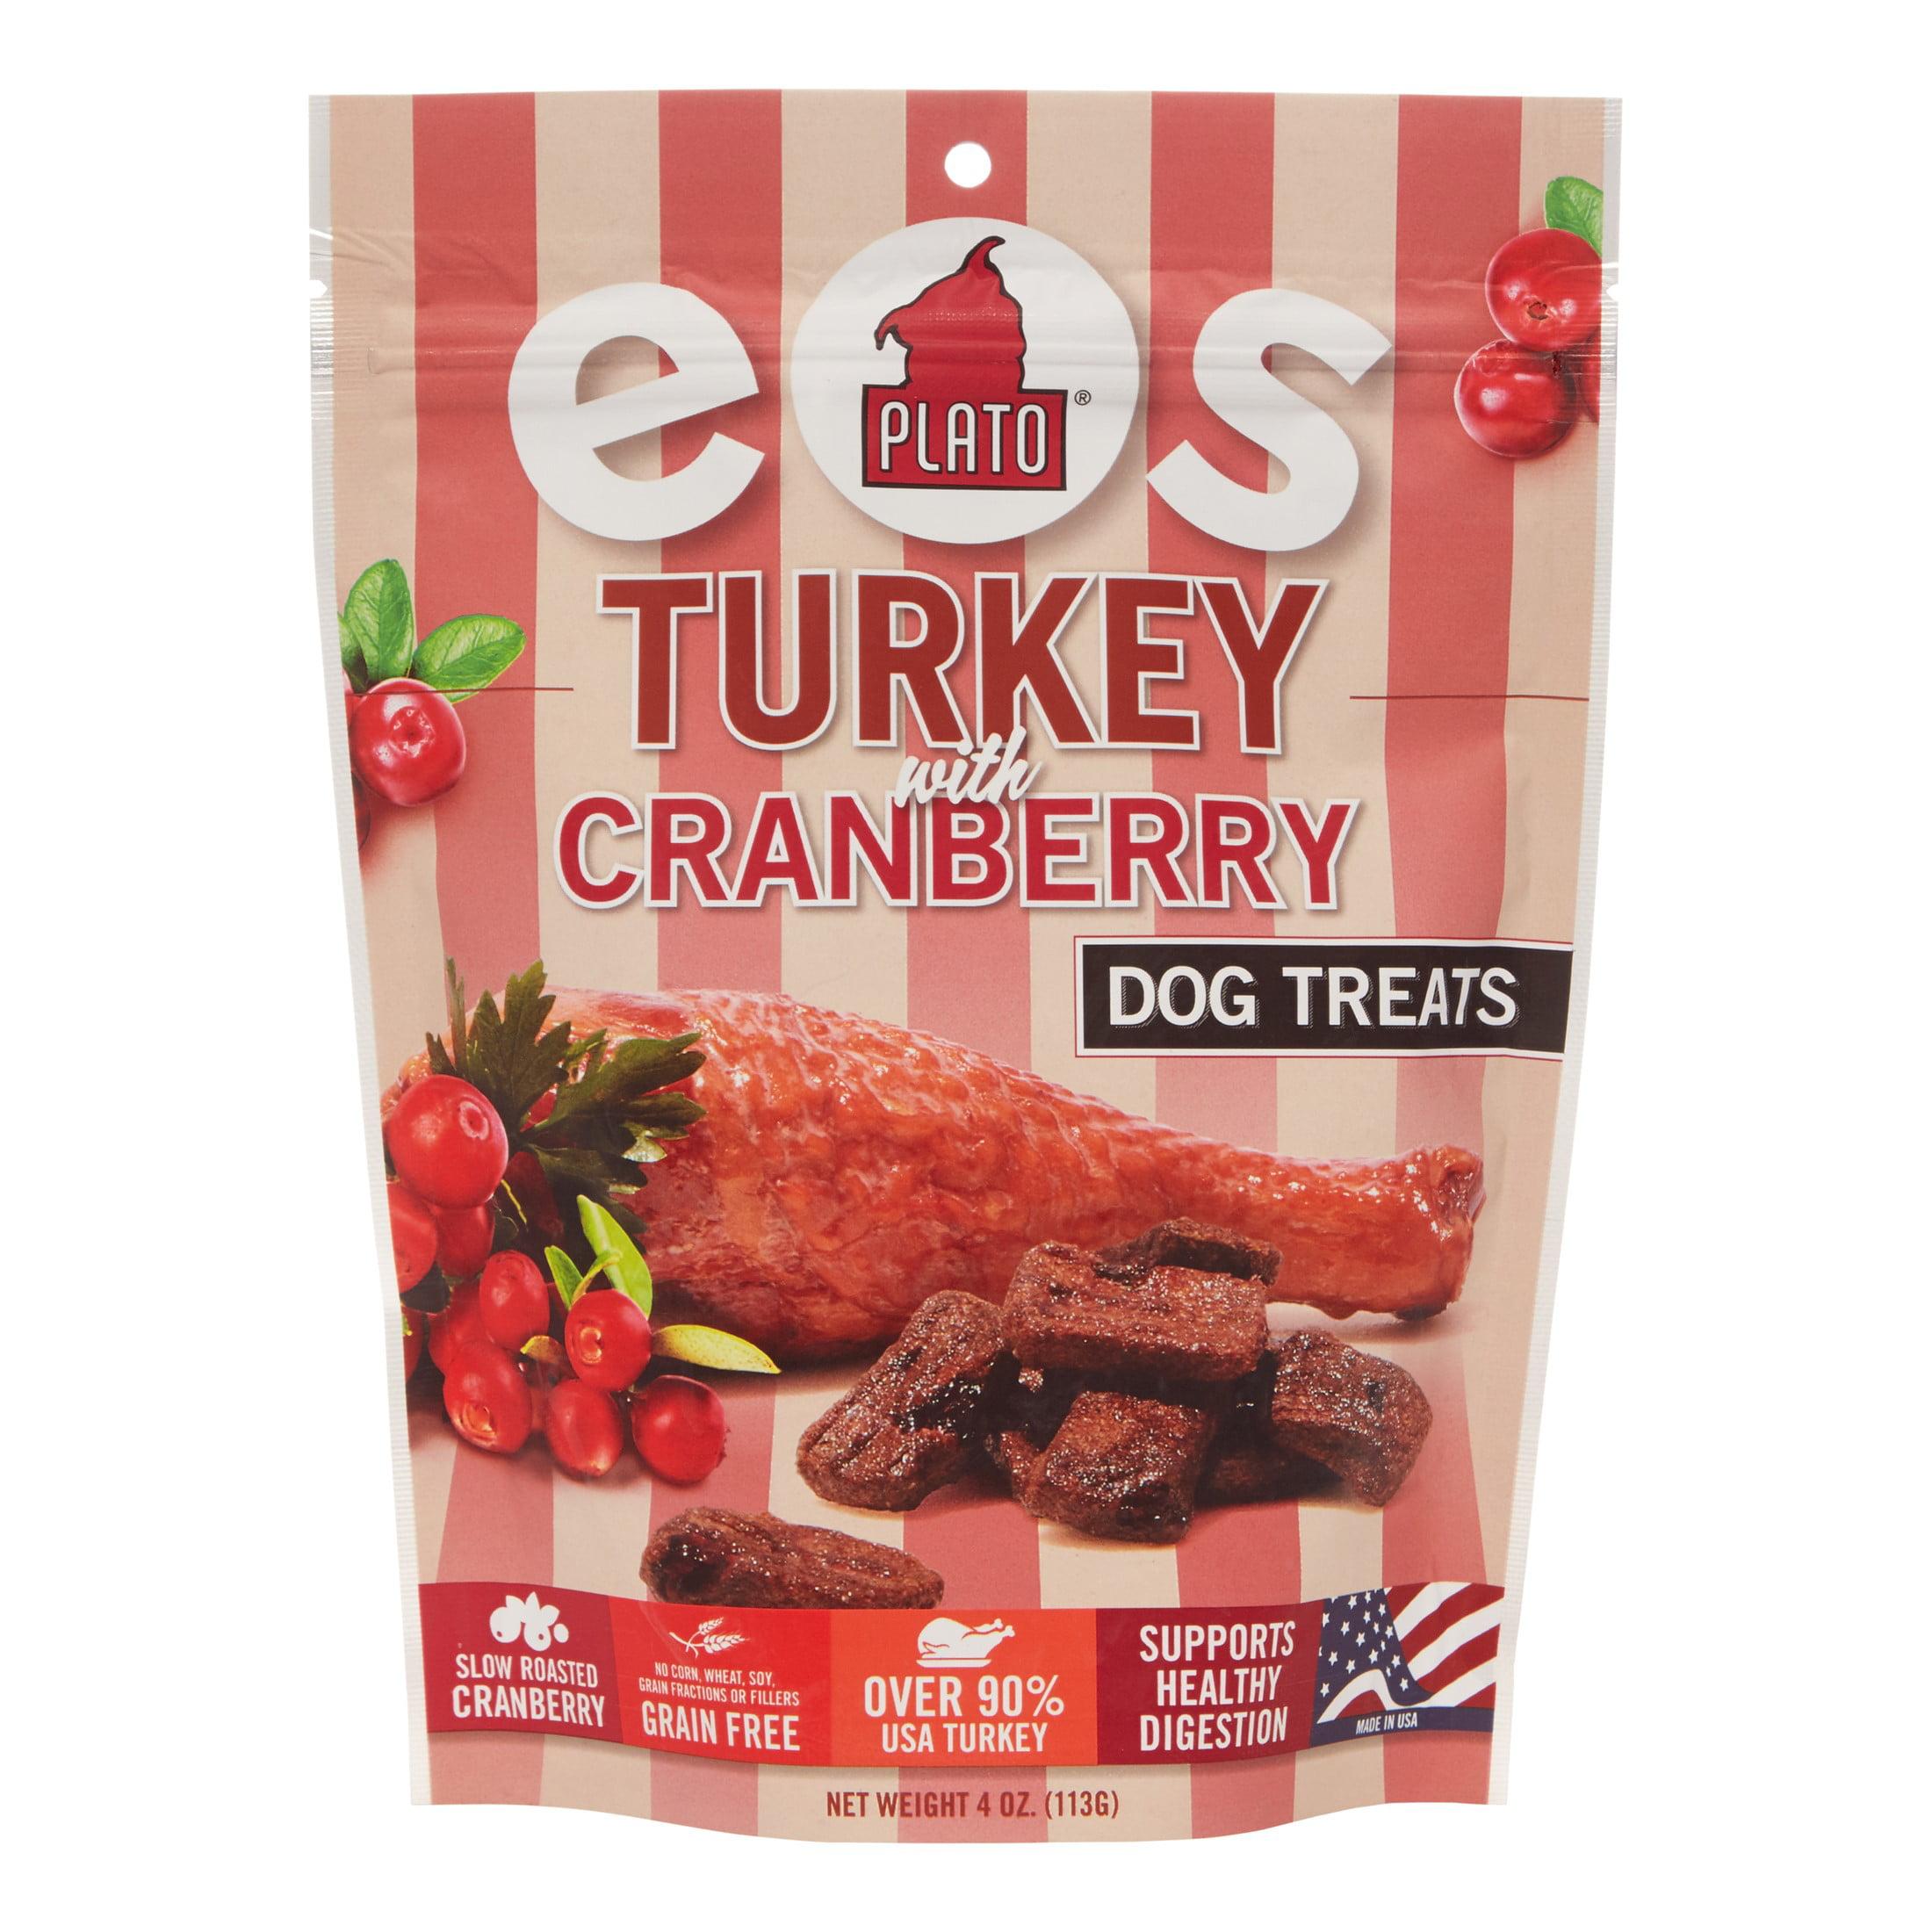 Plato Pet Treats EOS Turkey With Cranberry Dog Treats, 4 Oz by KDR Pet Treats, LLC